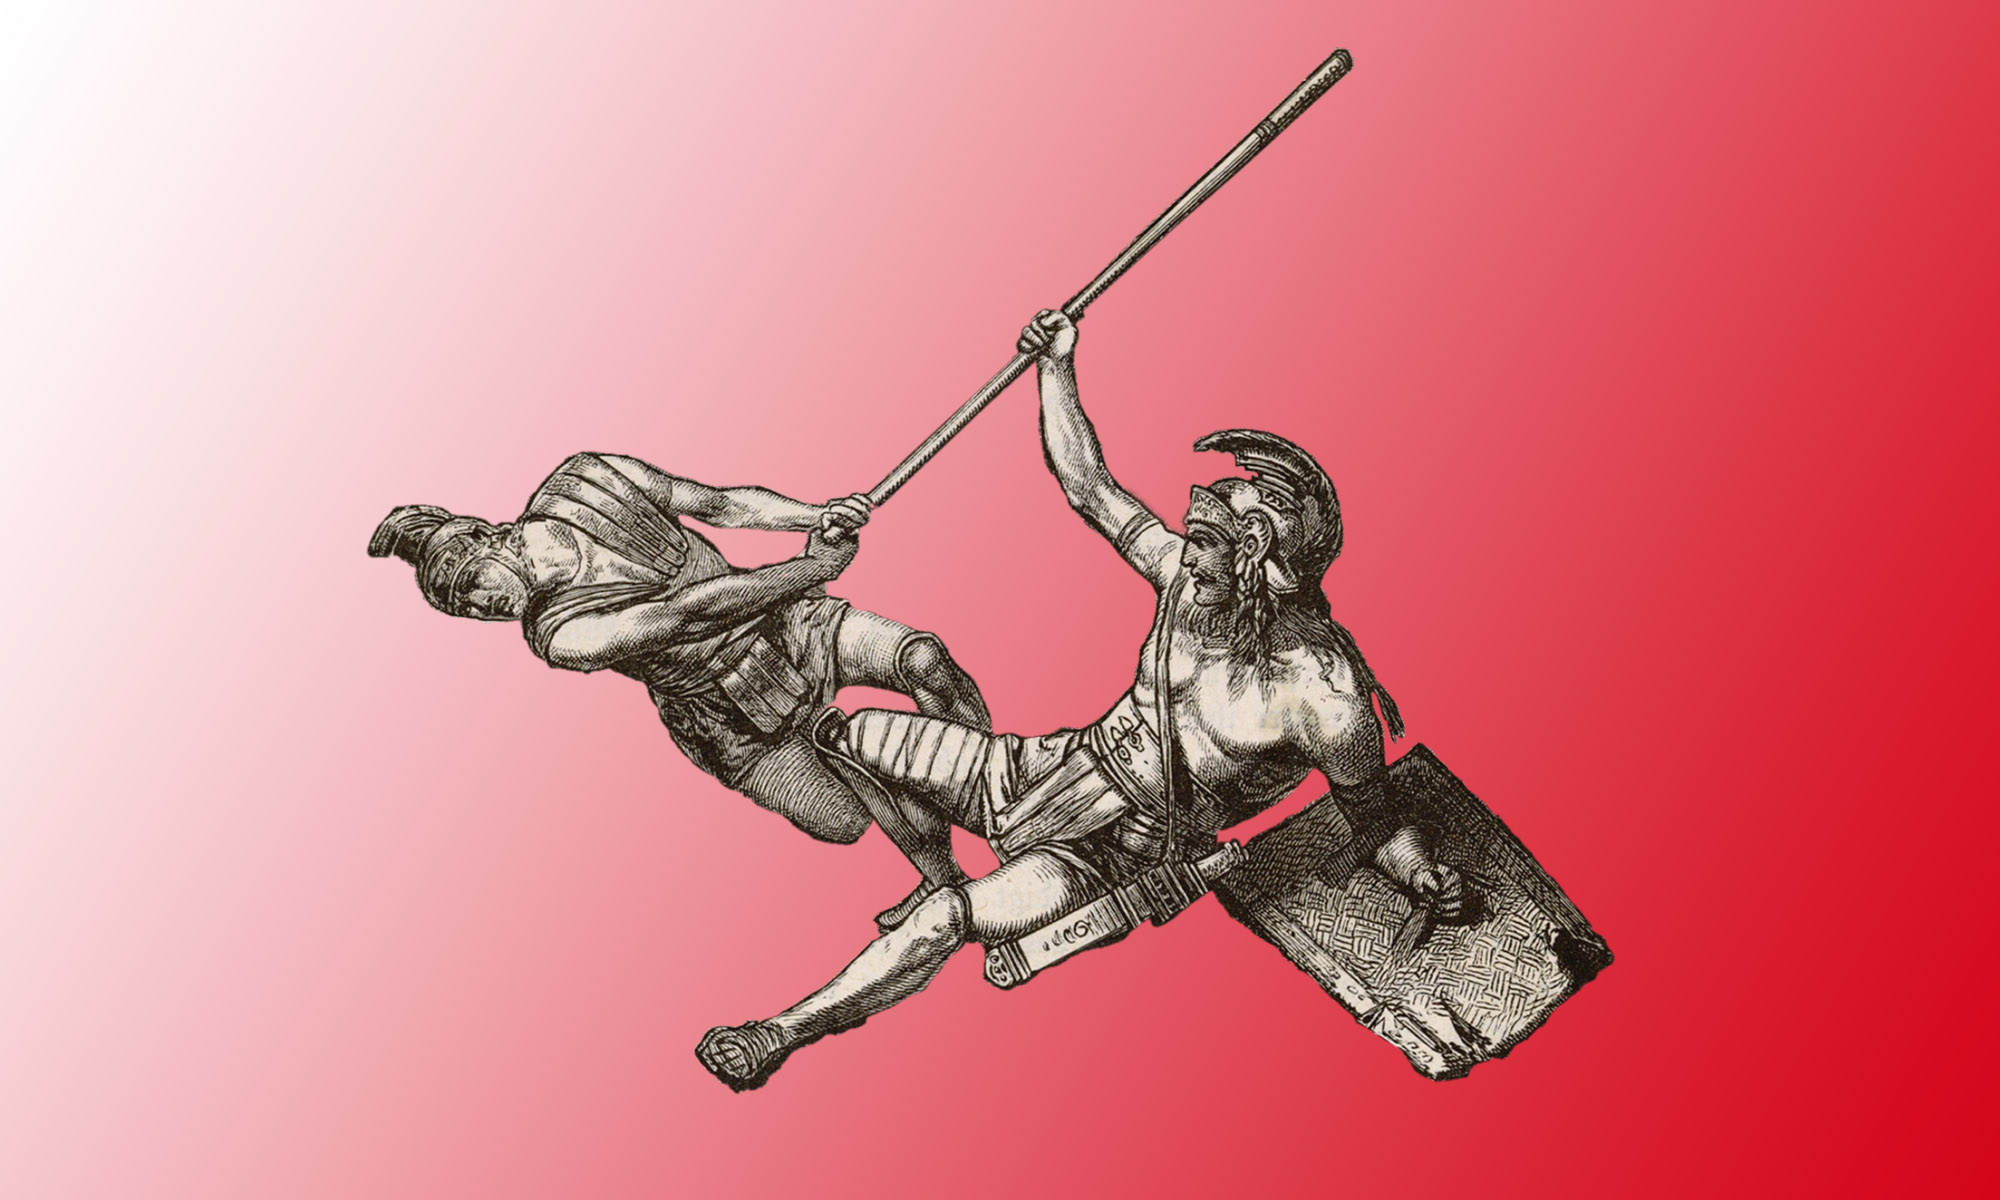 Cinquantottesima puntata. I nemici di Roma: Spartaco